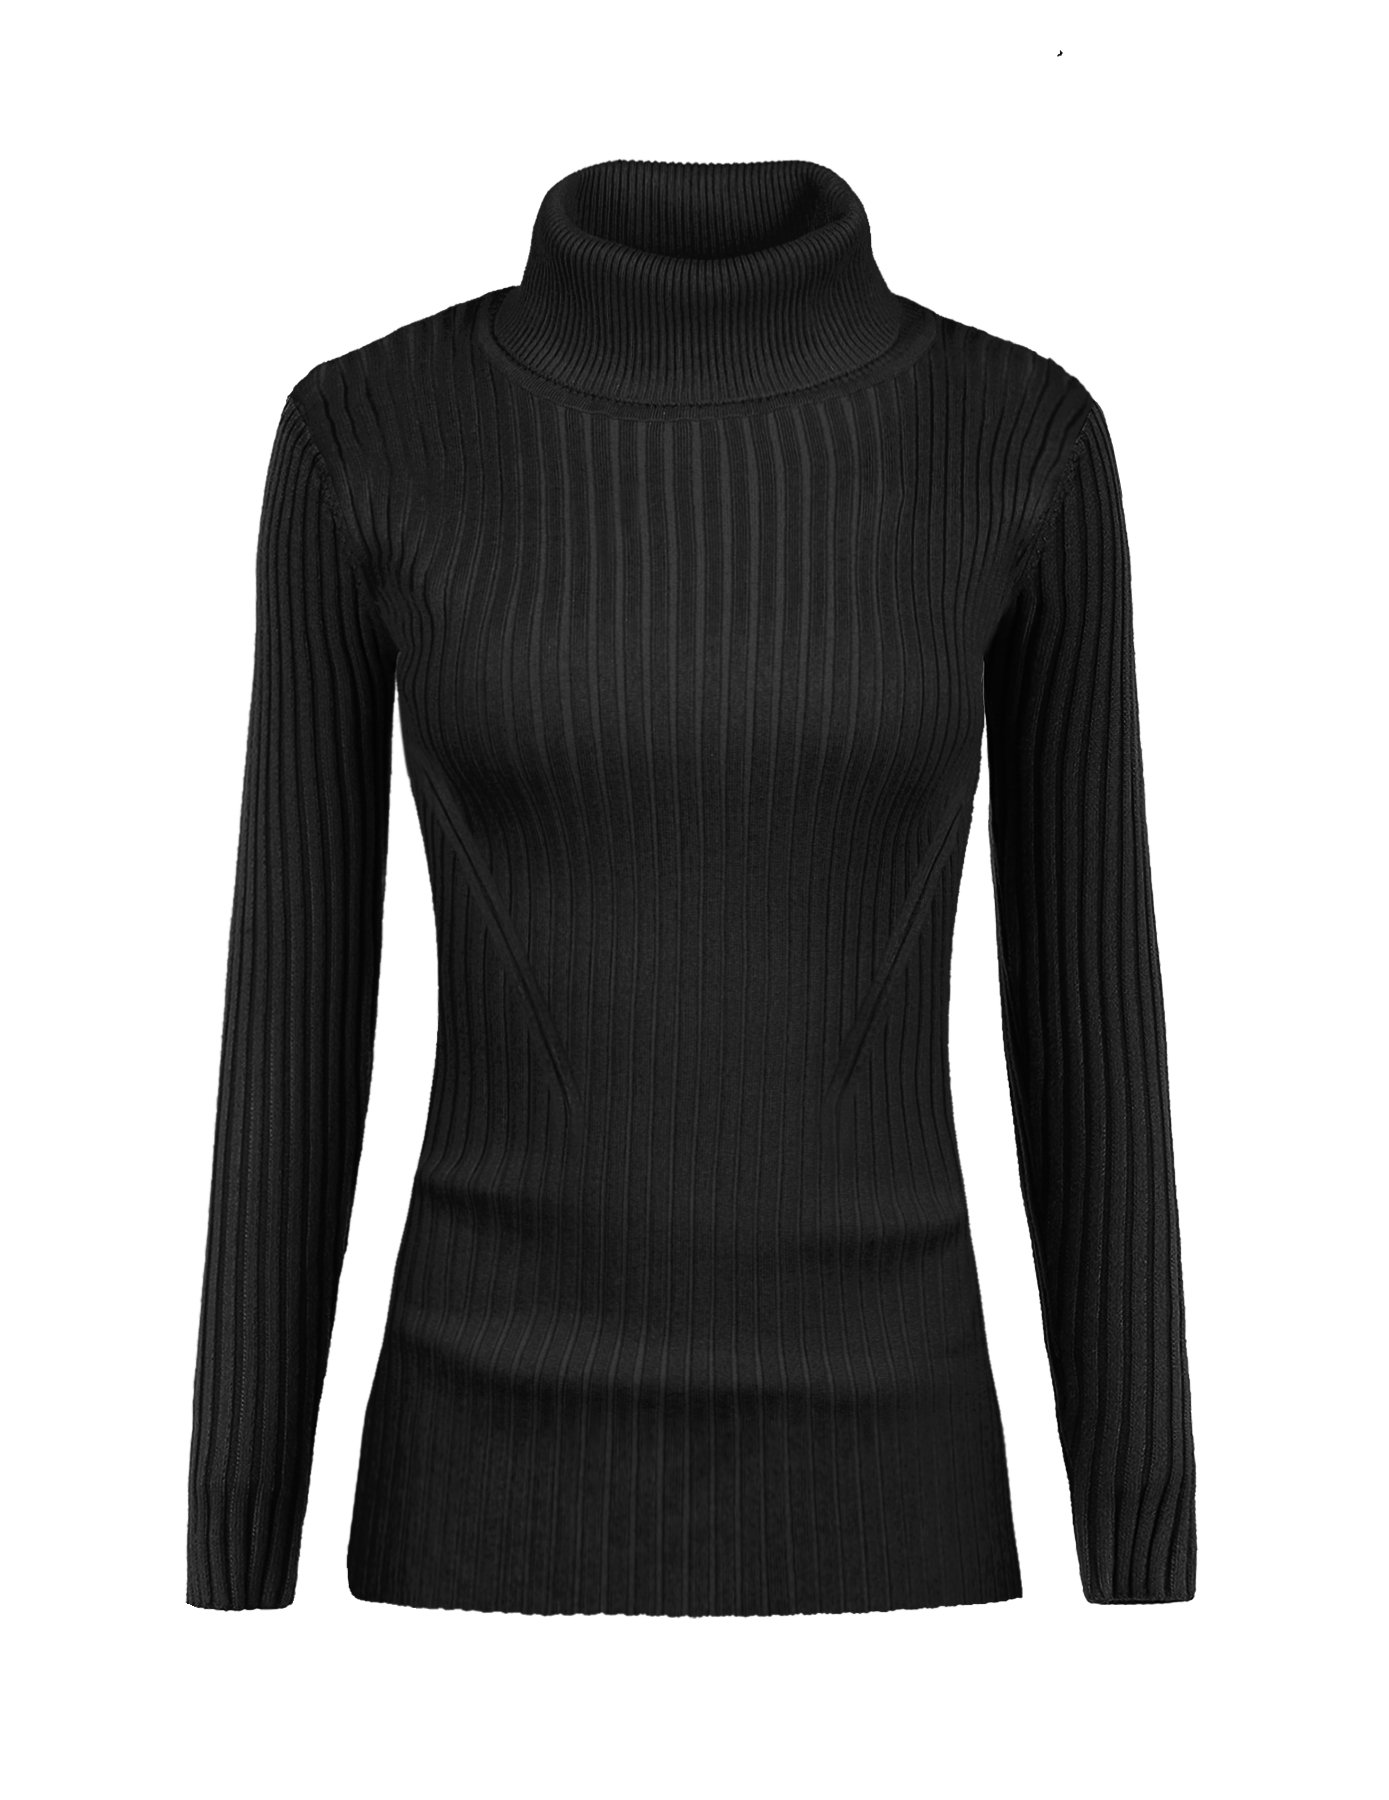 v28 Women's Sleeveless Ribbed High Neck Turtleneck Stretchable Knit Sweater Top (Large, Turtblack1)